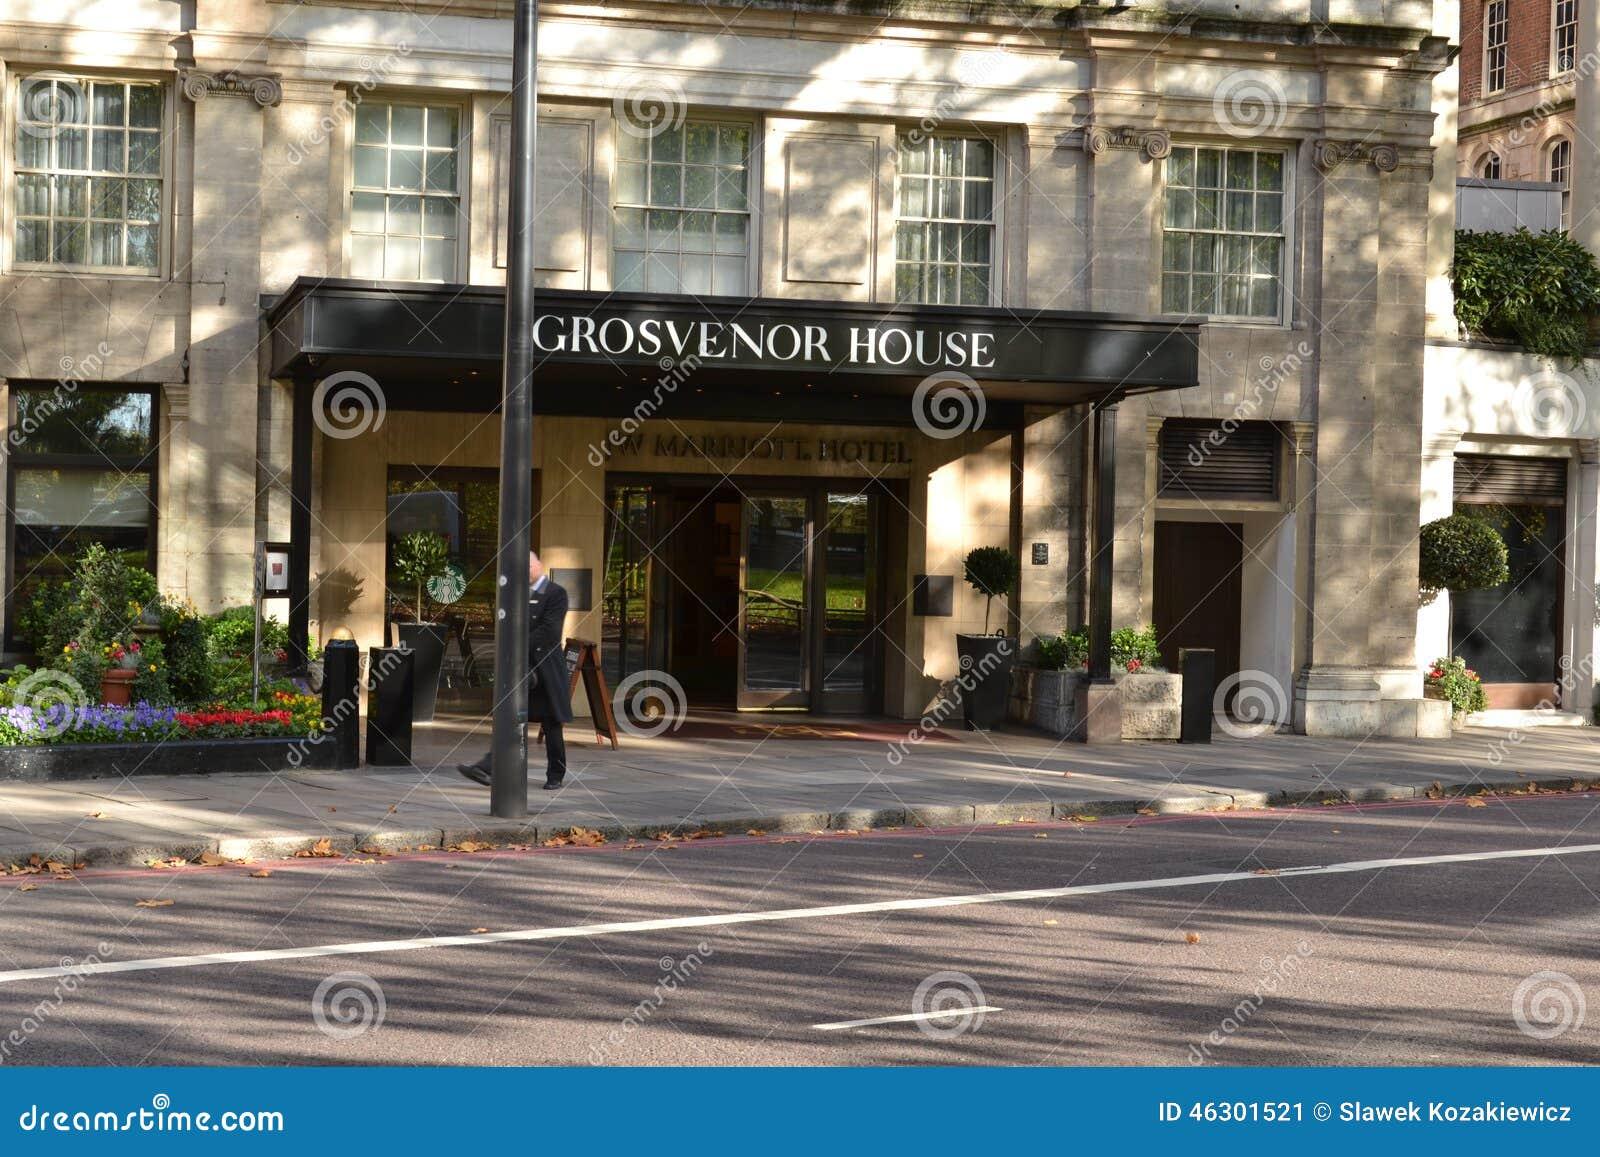 Jw Marriott Hotel London